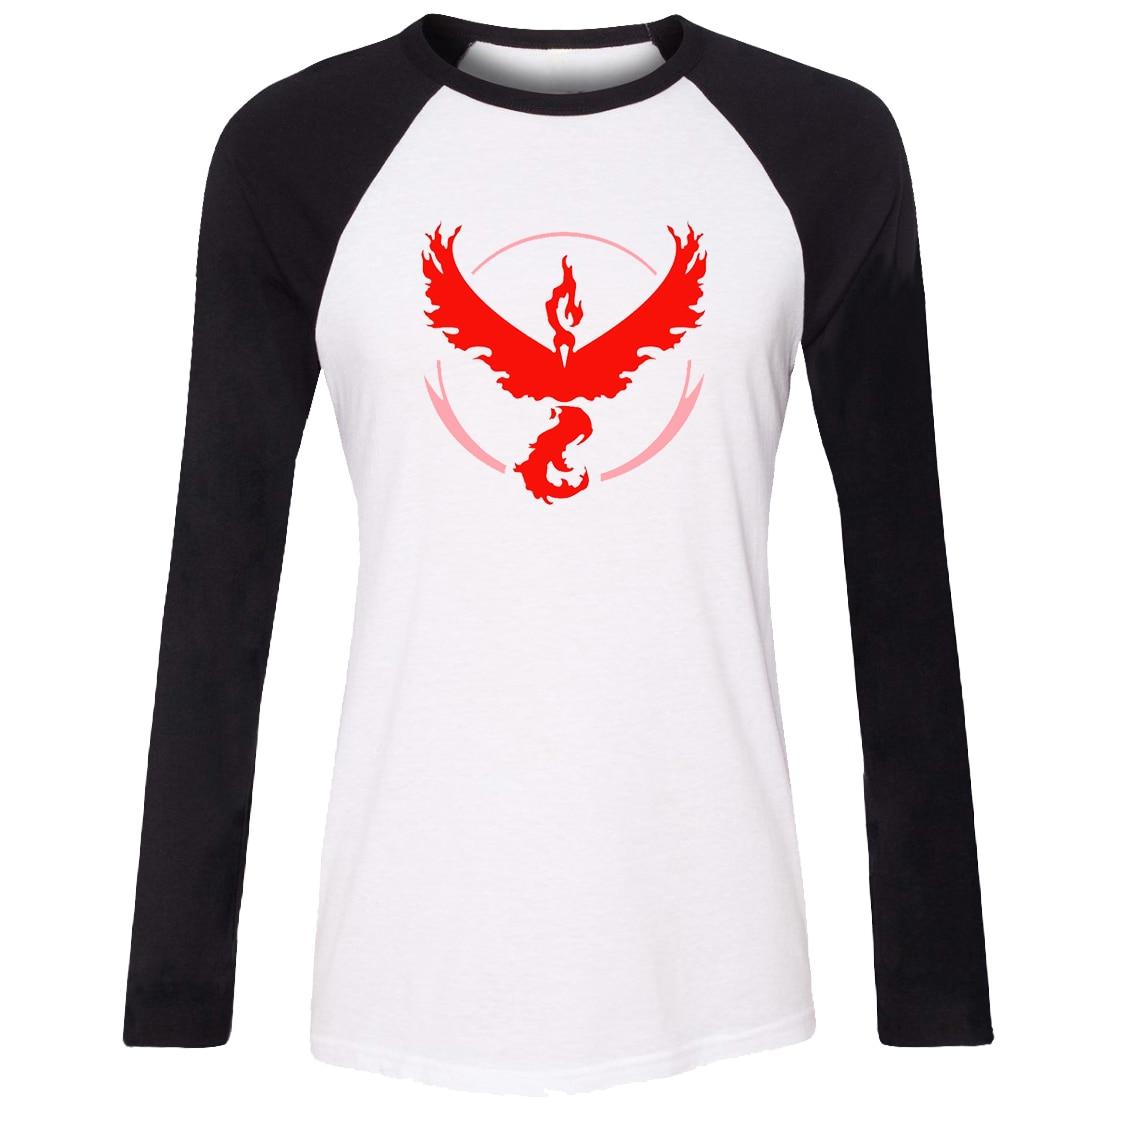 iDzn Women T-shirt Pokemon Go Game Fans Moltres Team Red Team Pattern Raglan Long Sleeve Girl T shirt print Lady Tee Tops